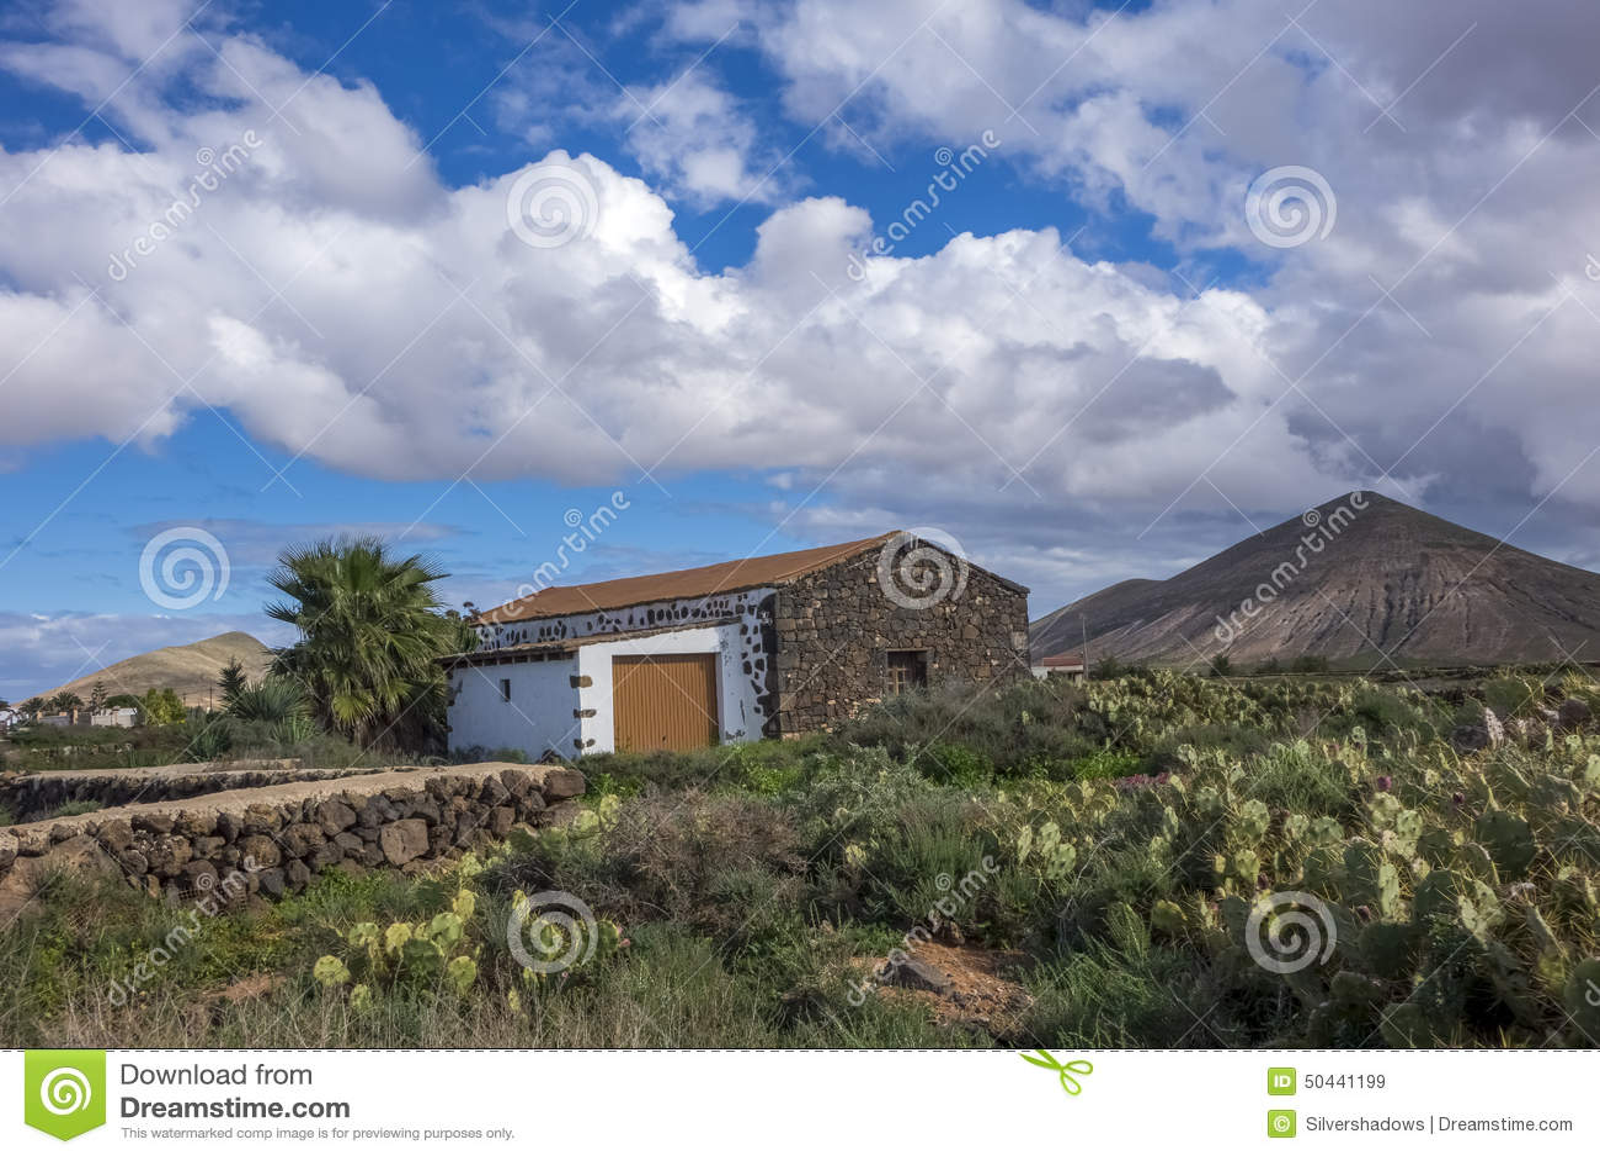 Cacti And Mountain View La Oliva Fuerteventura Las Palmas Canary Islands Spain Stock Photo